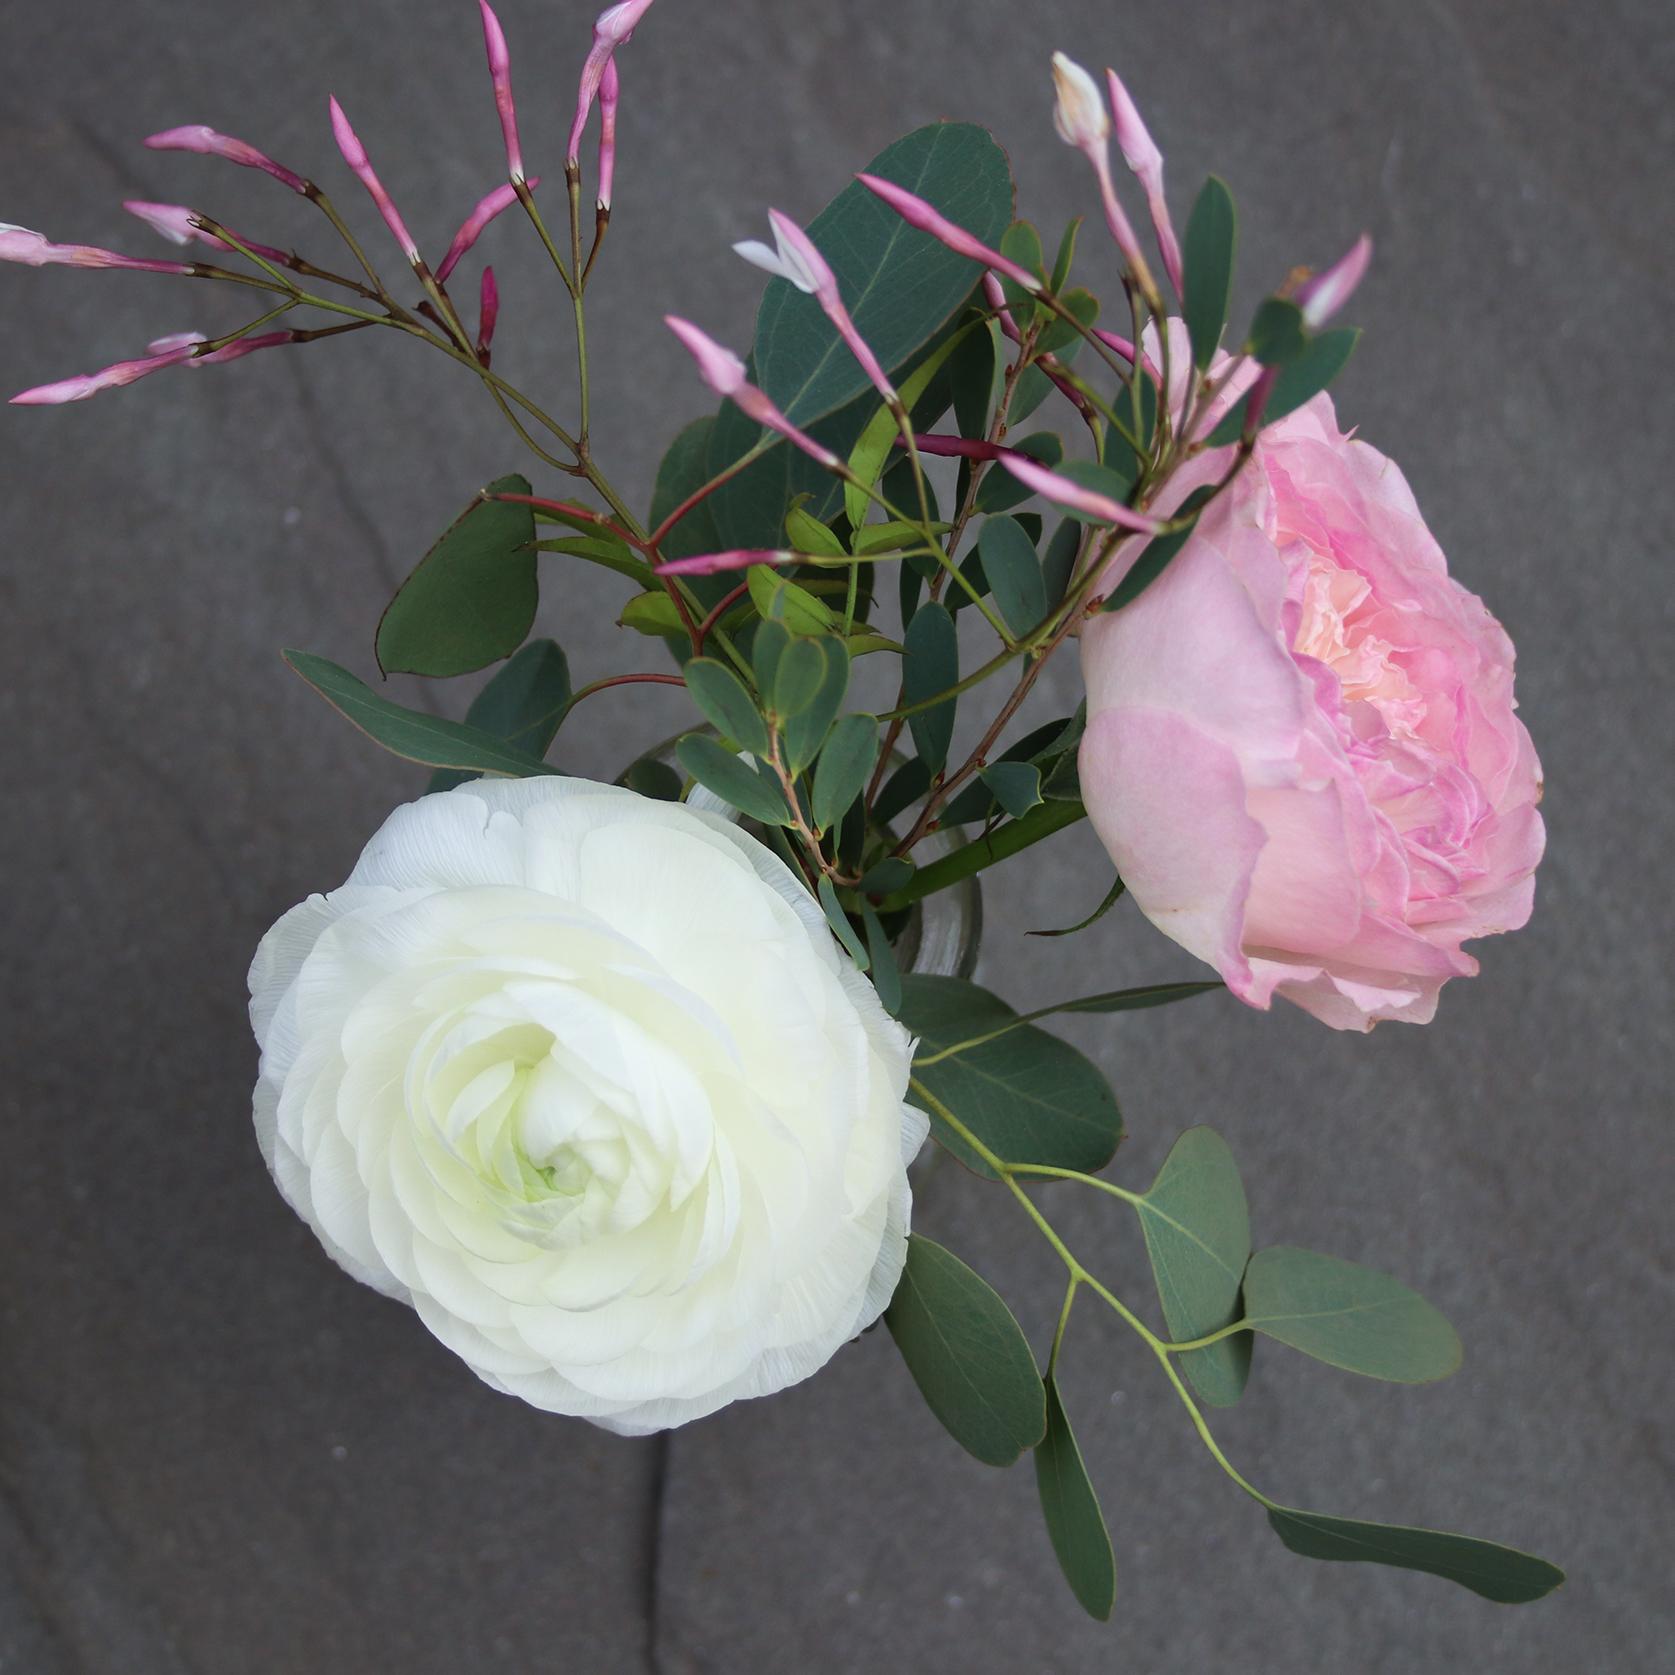 Cecilia-flowers-2 square.jpg